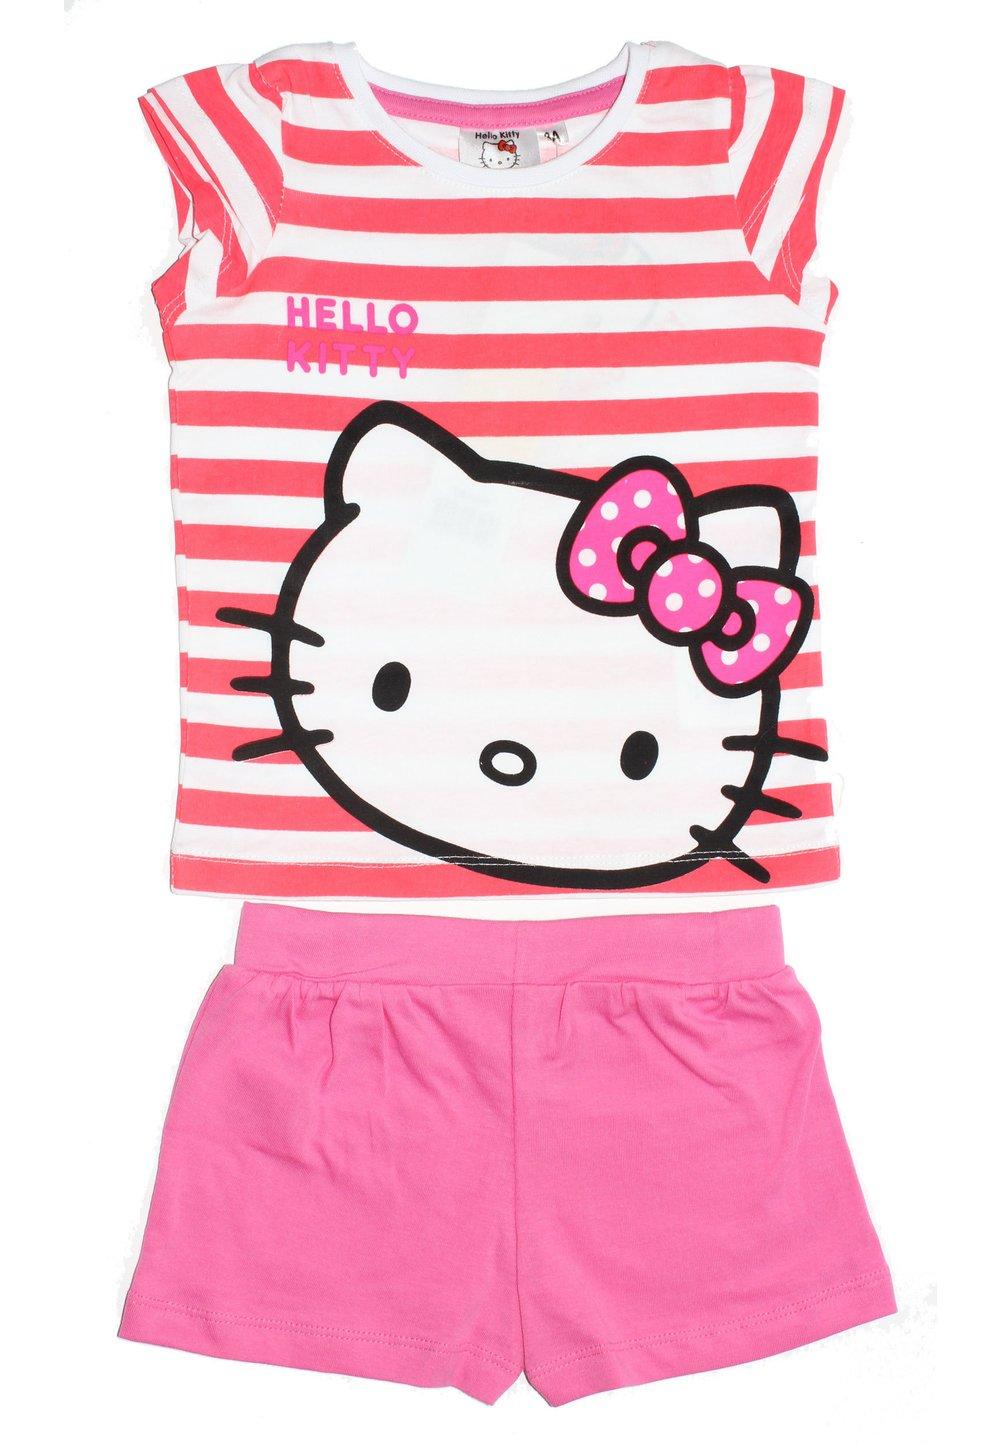 Compleu hello kitty roz 5456 imagine